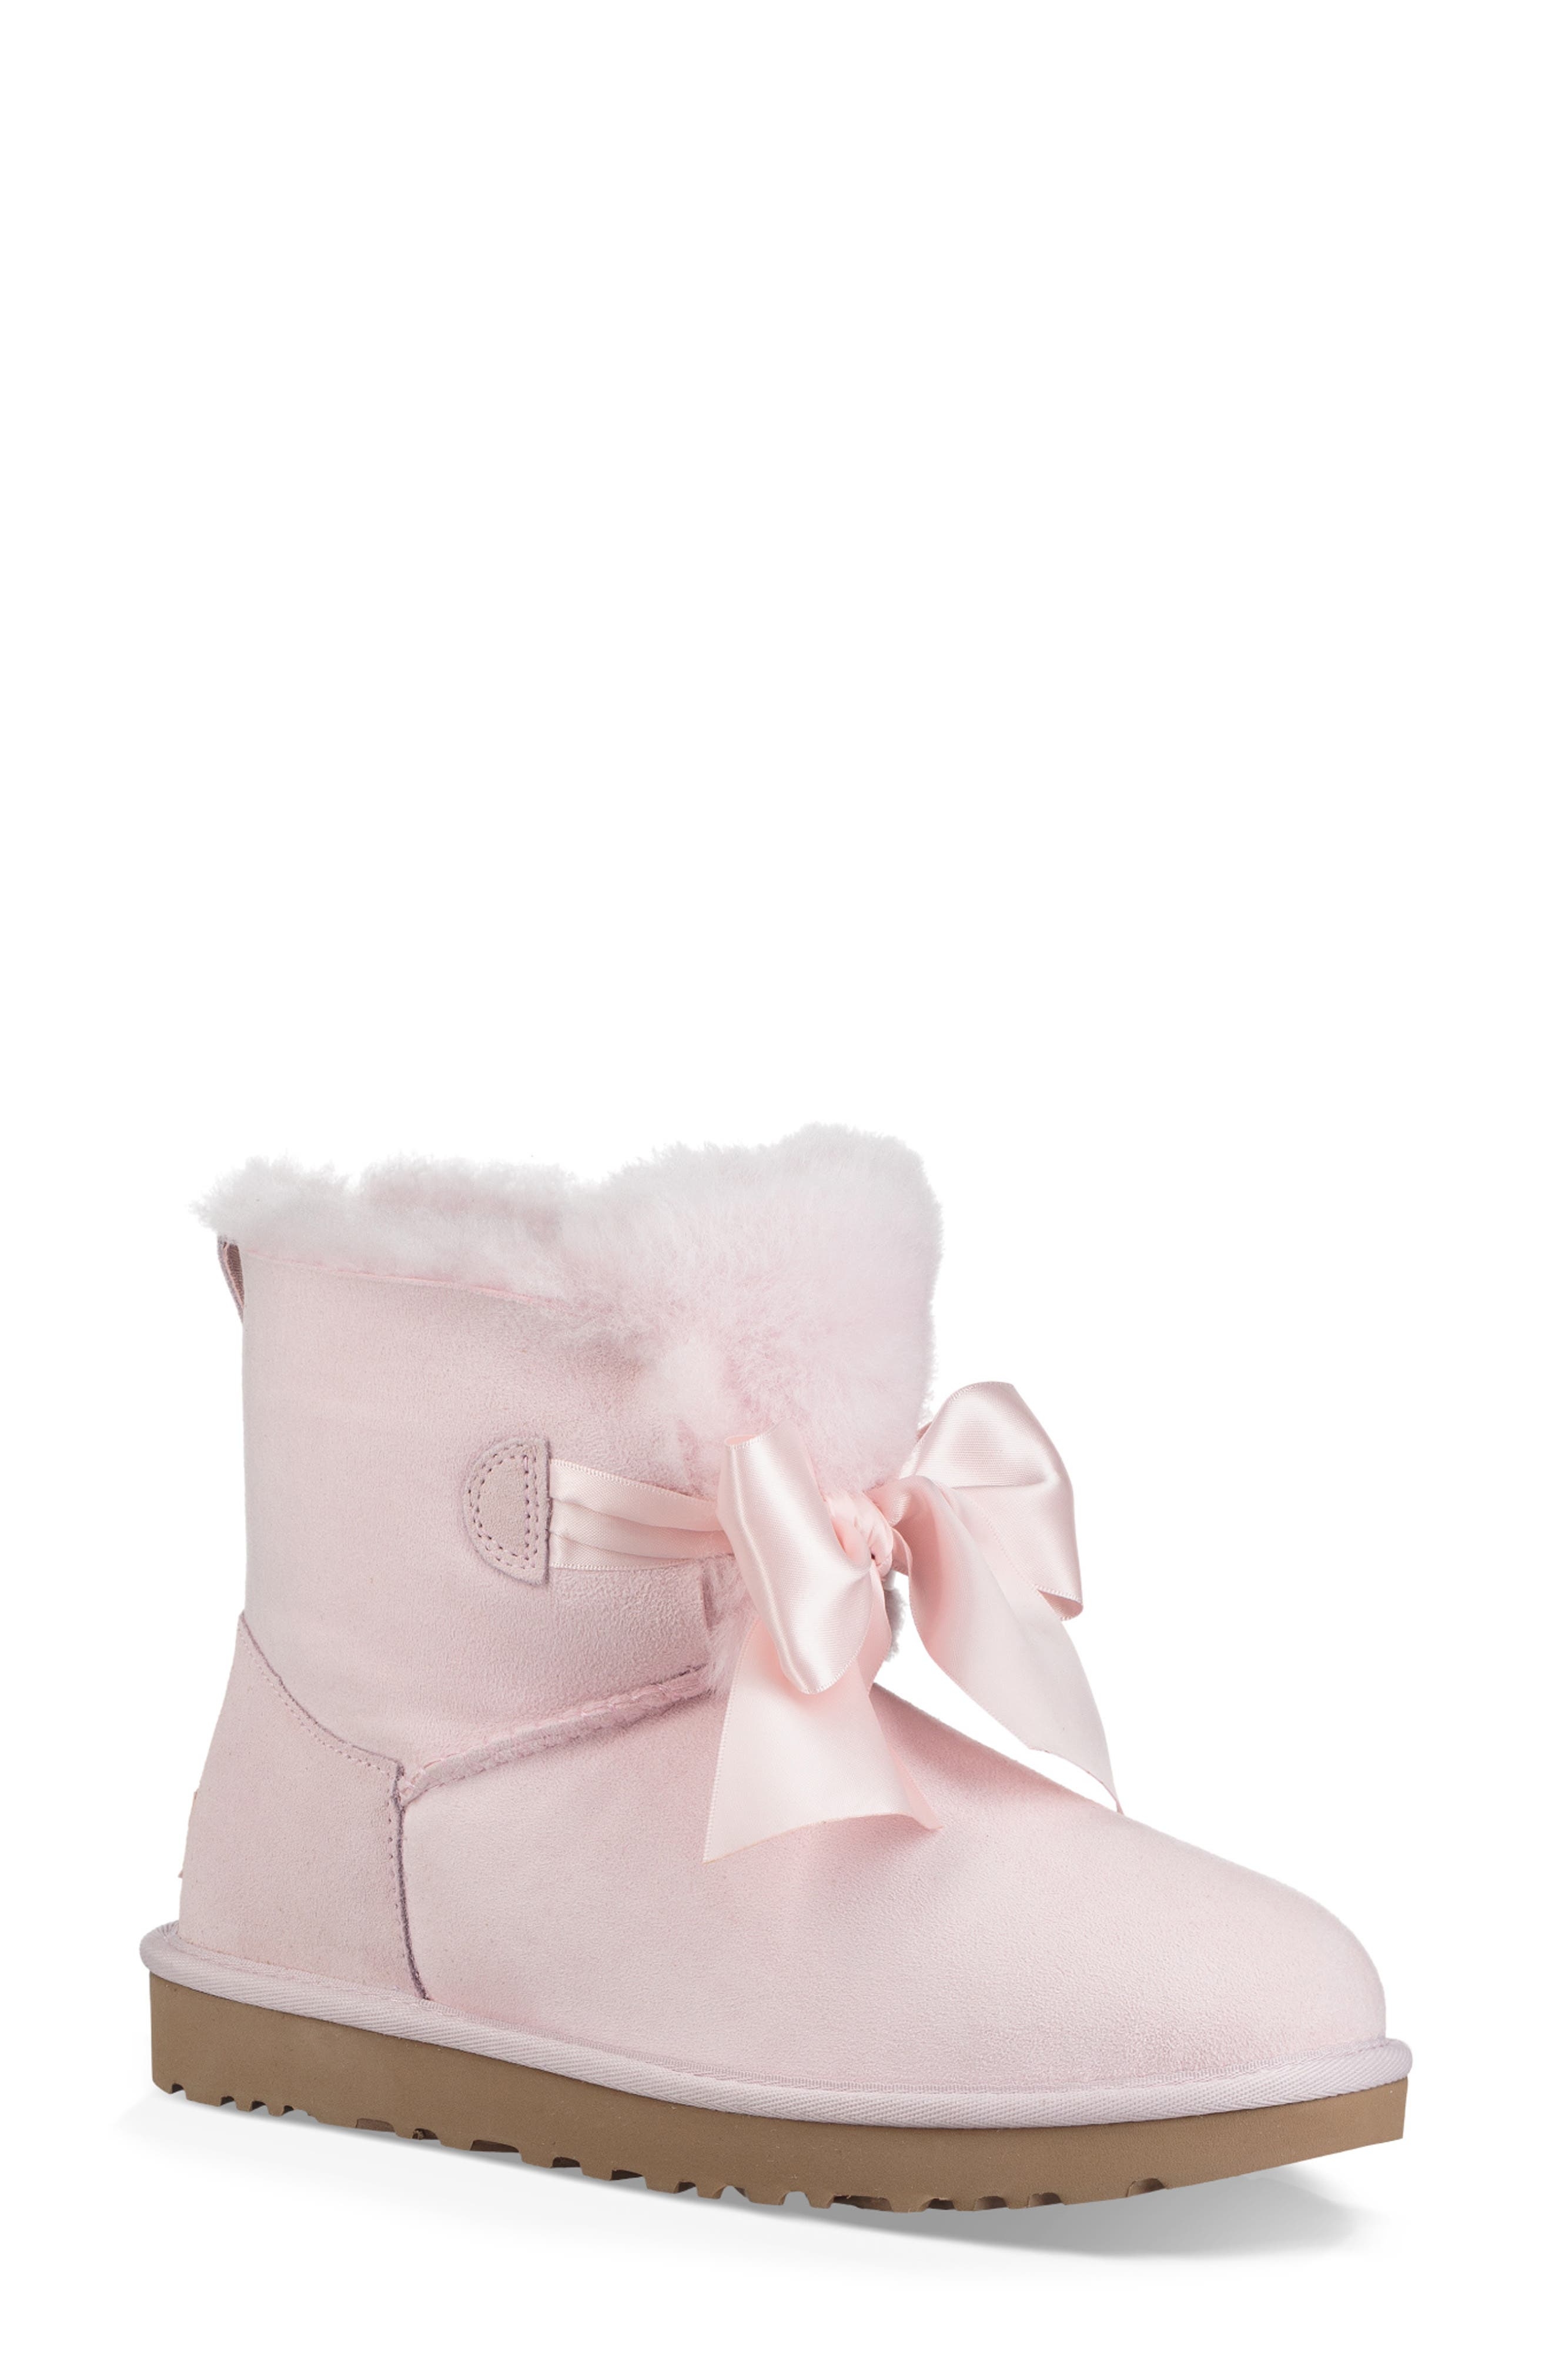 9cc6b35ff77 italy ugg pink boots women c6389 d8584